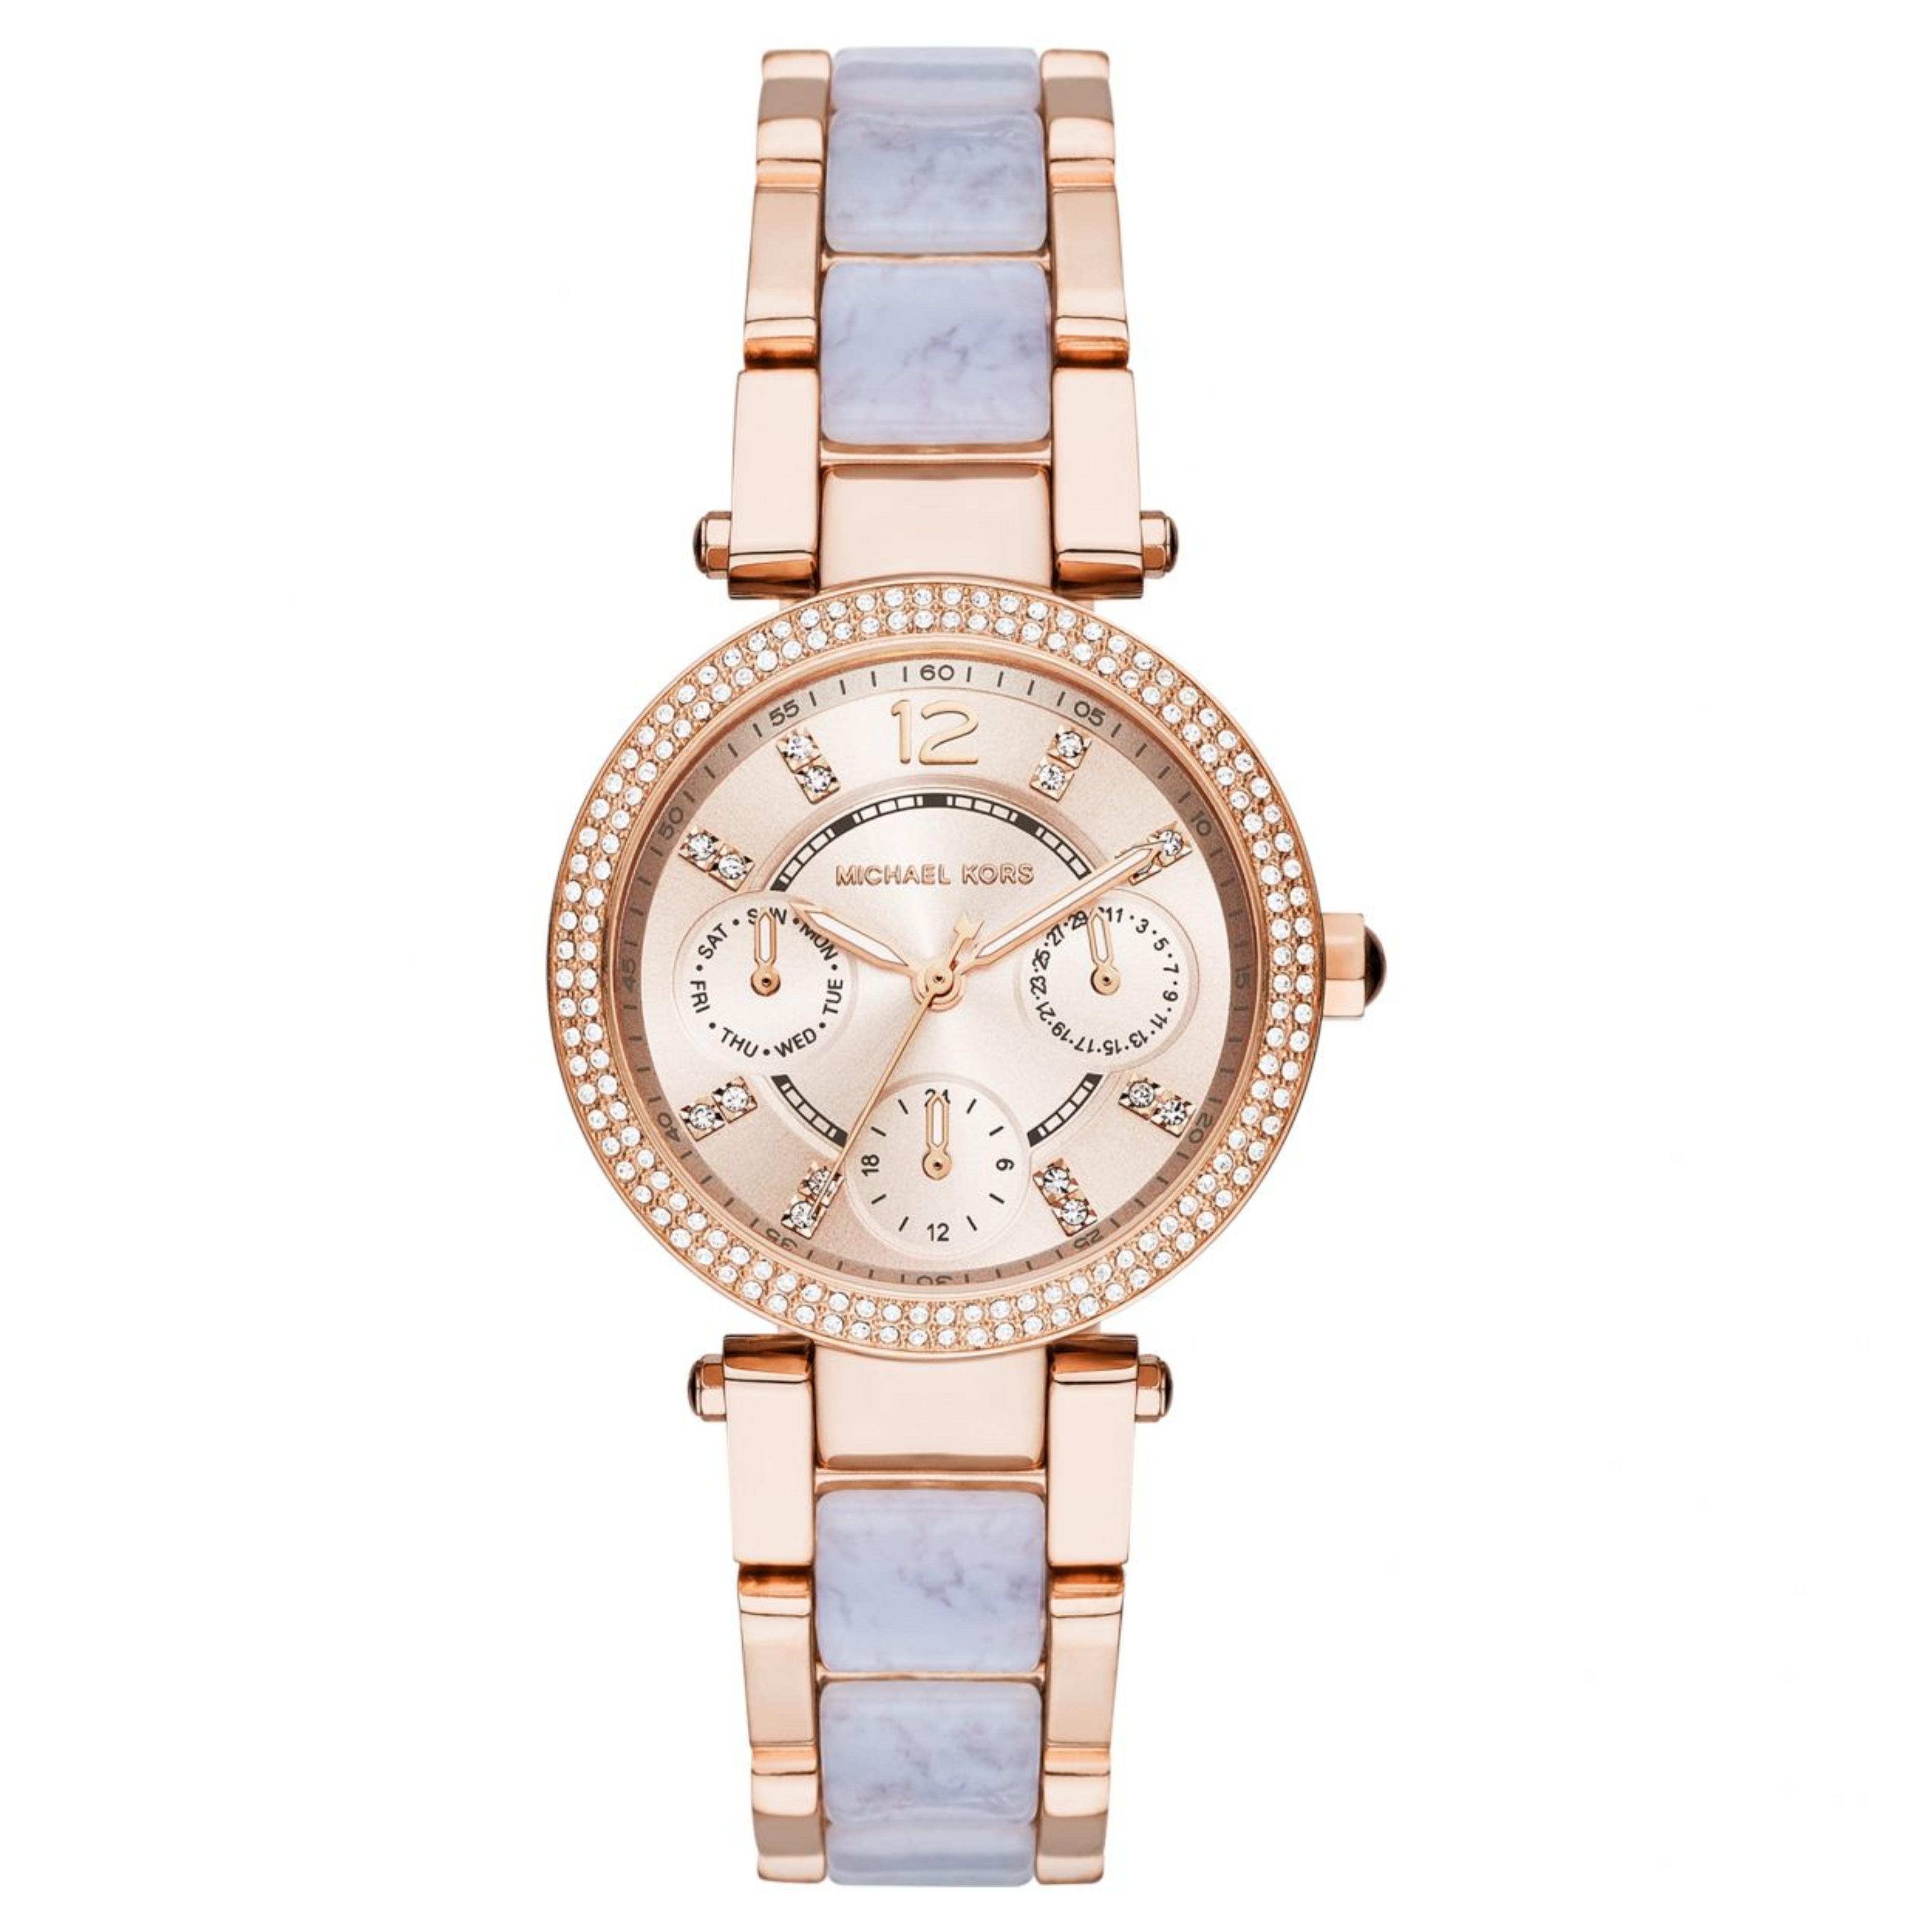 Michael Kors Mini Parker Ladies Watch|Chronograph Dial|Dual Tone Bracelet|MK6327